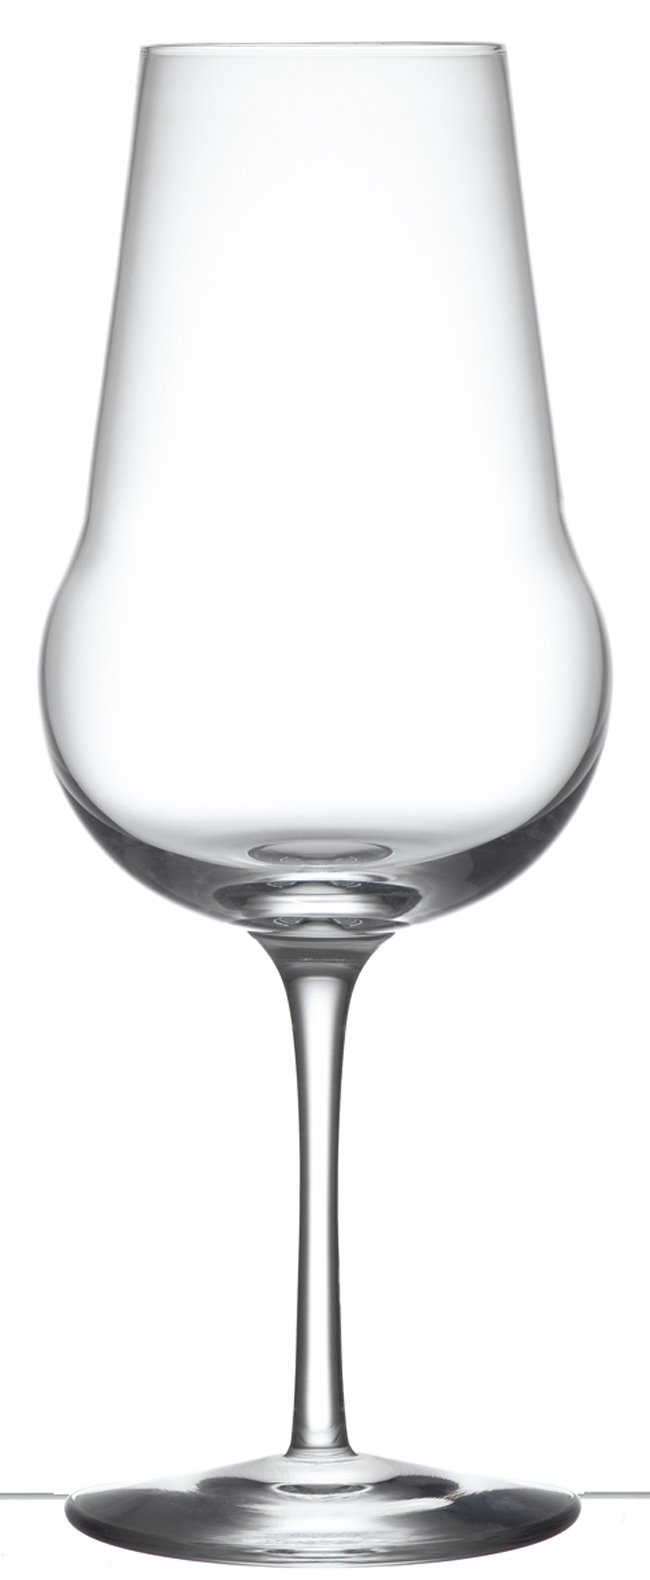 La Rochere Set Of 6, 13-ounce Echo Mouth Blown Glasses by La Rochere